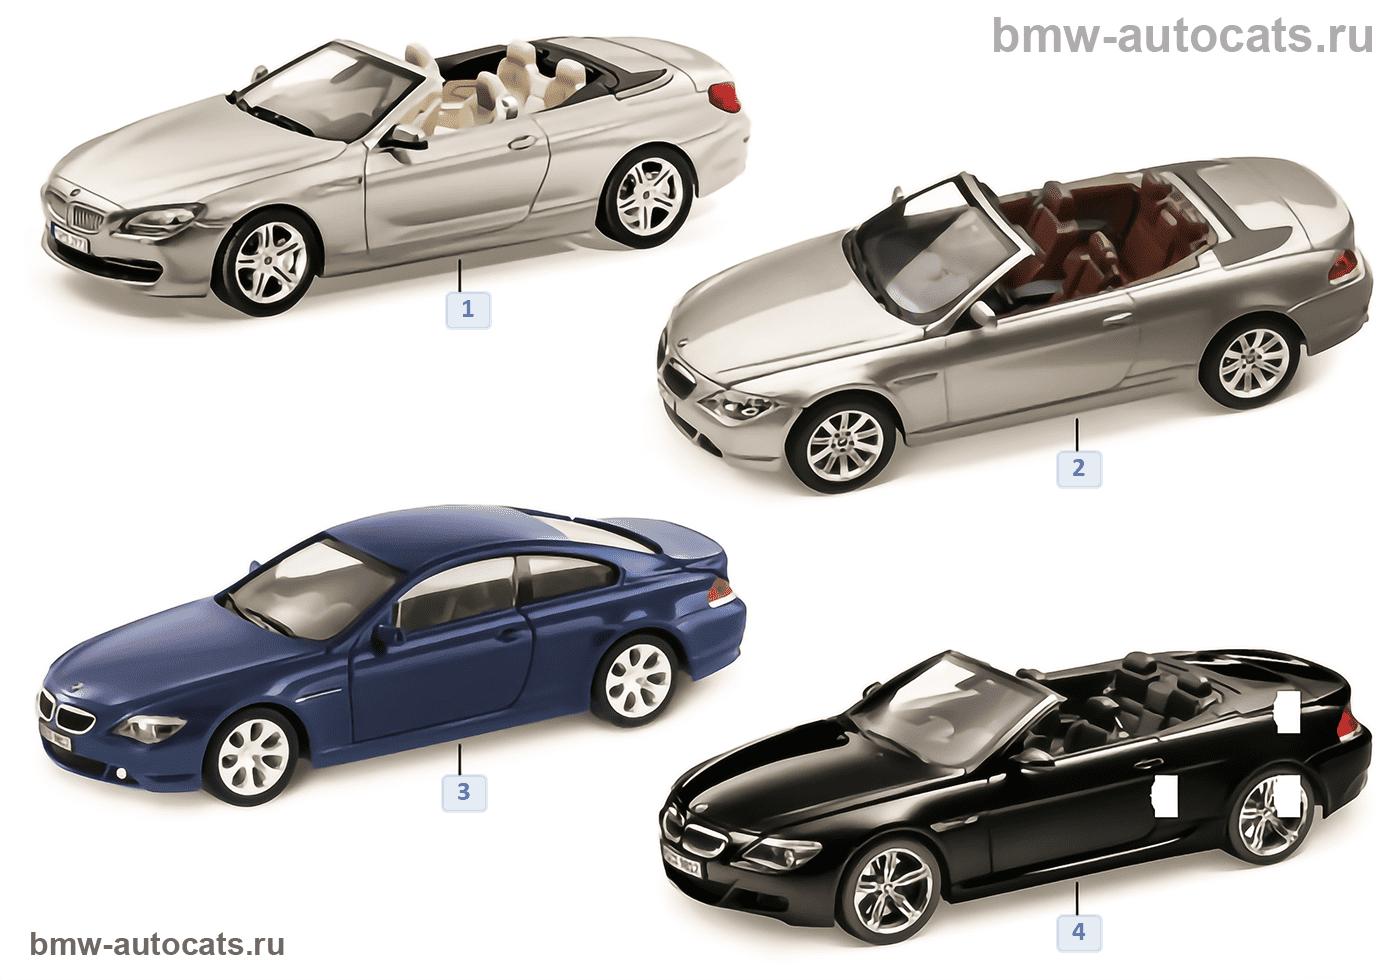 BMW Miniaturen — BMW 6er Reihe 2010/11